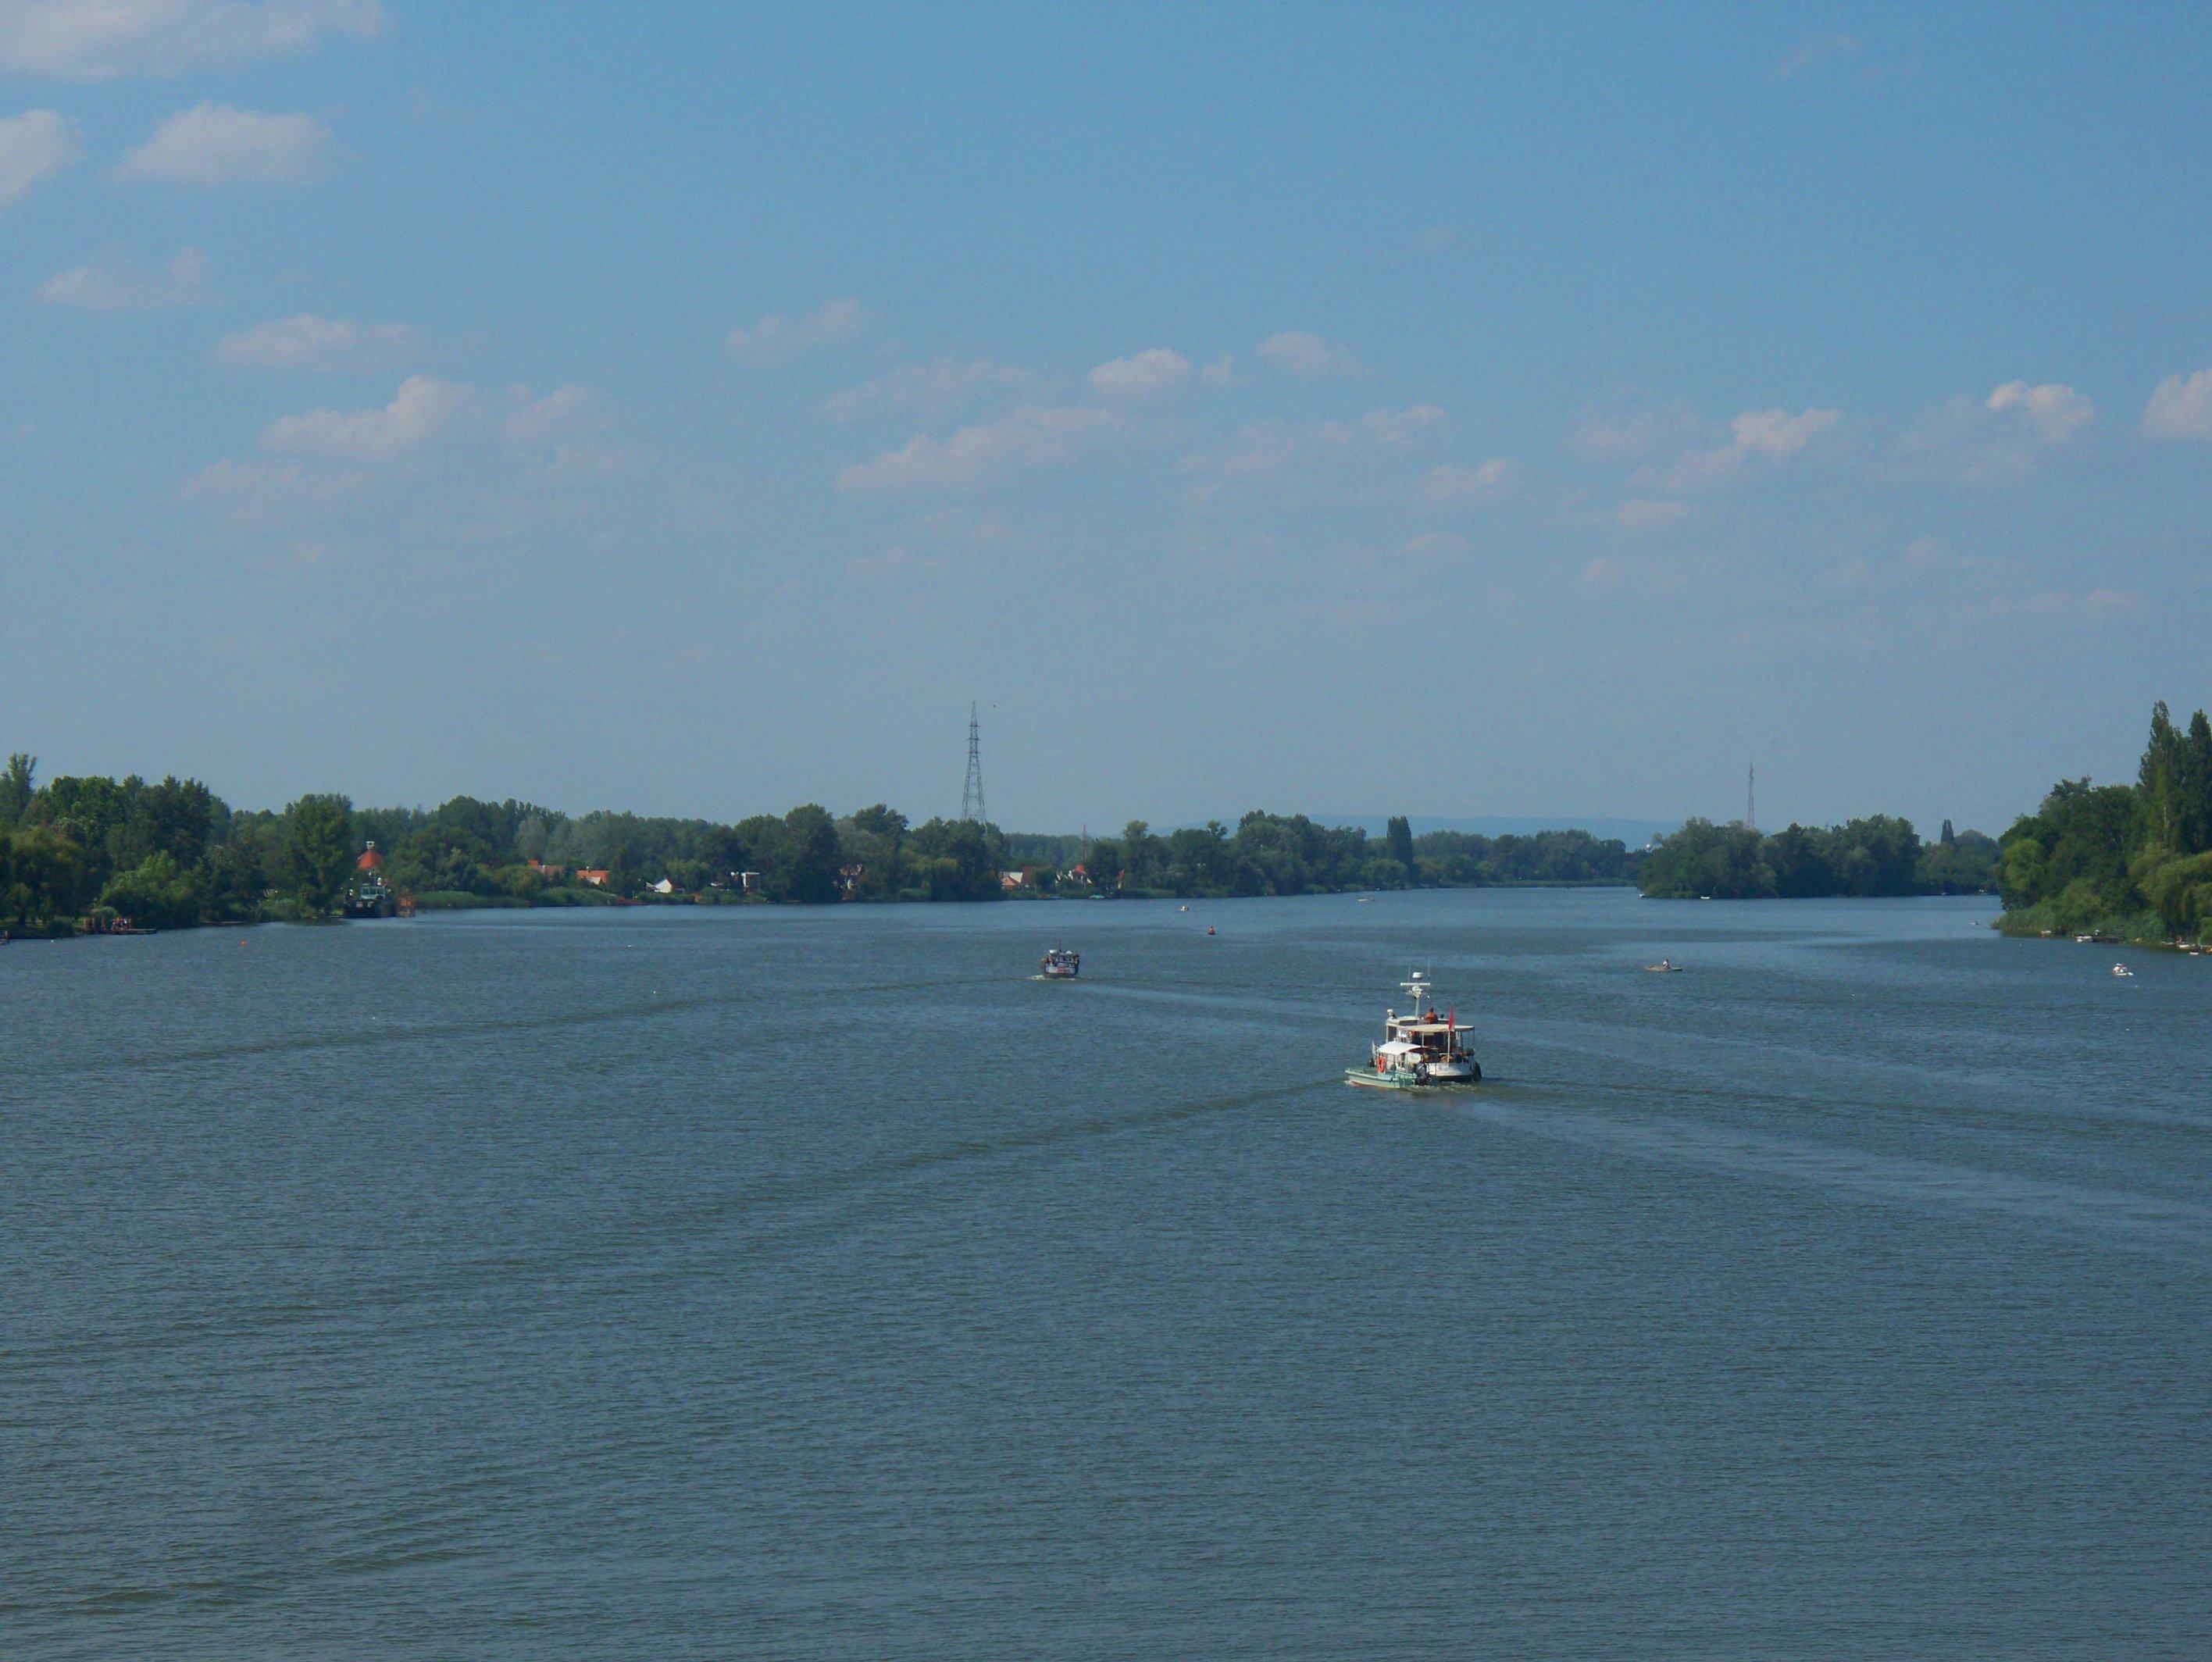 http://www.kisdunainagyhajok.hu/egyebhajok/2012_06_24_maritime_motoros_vontatohajo_a_rackevei-hidnal/2012_06_24_maritime_motoros_vontatohajo_a_rackevei-hidnal_014.jpg